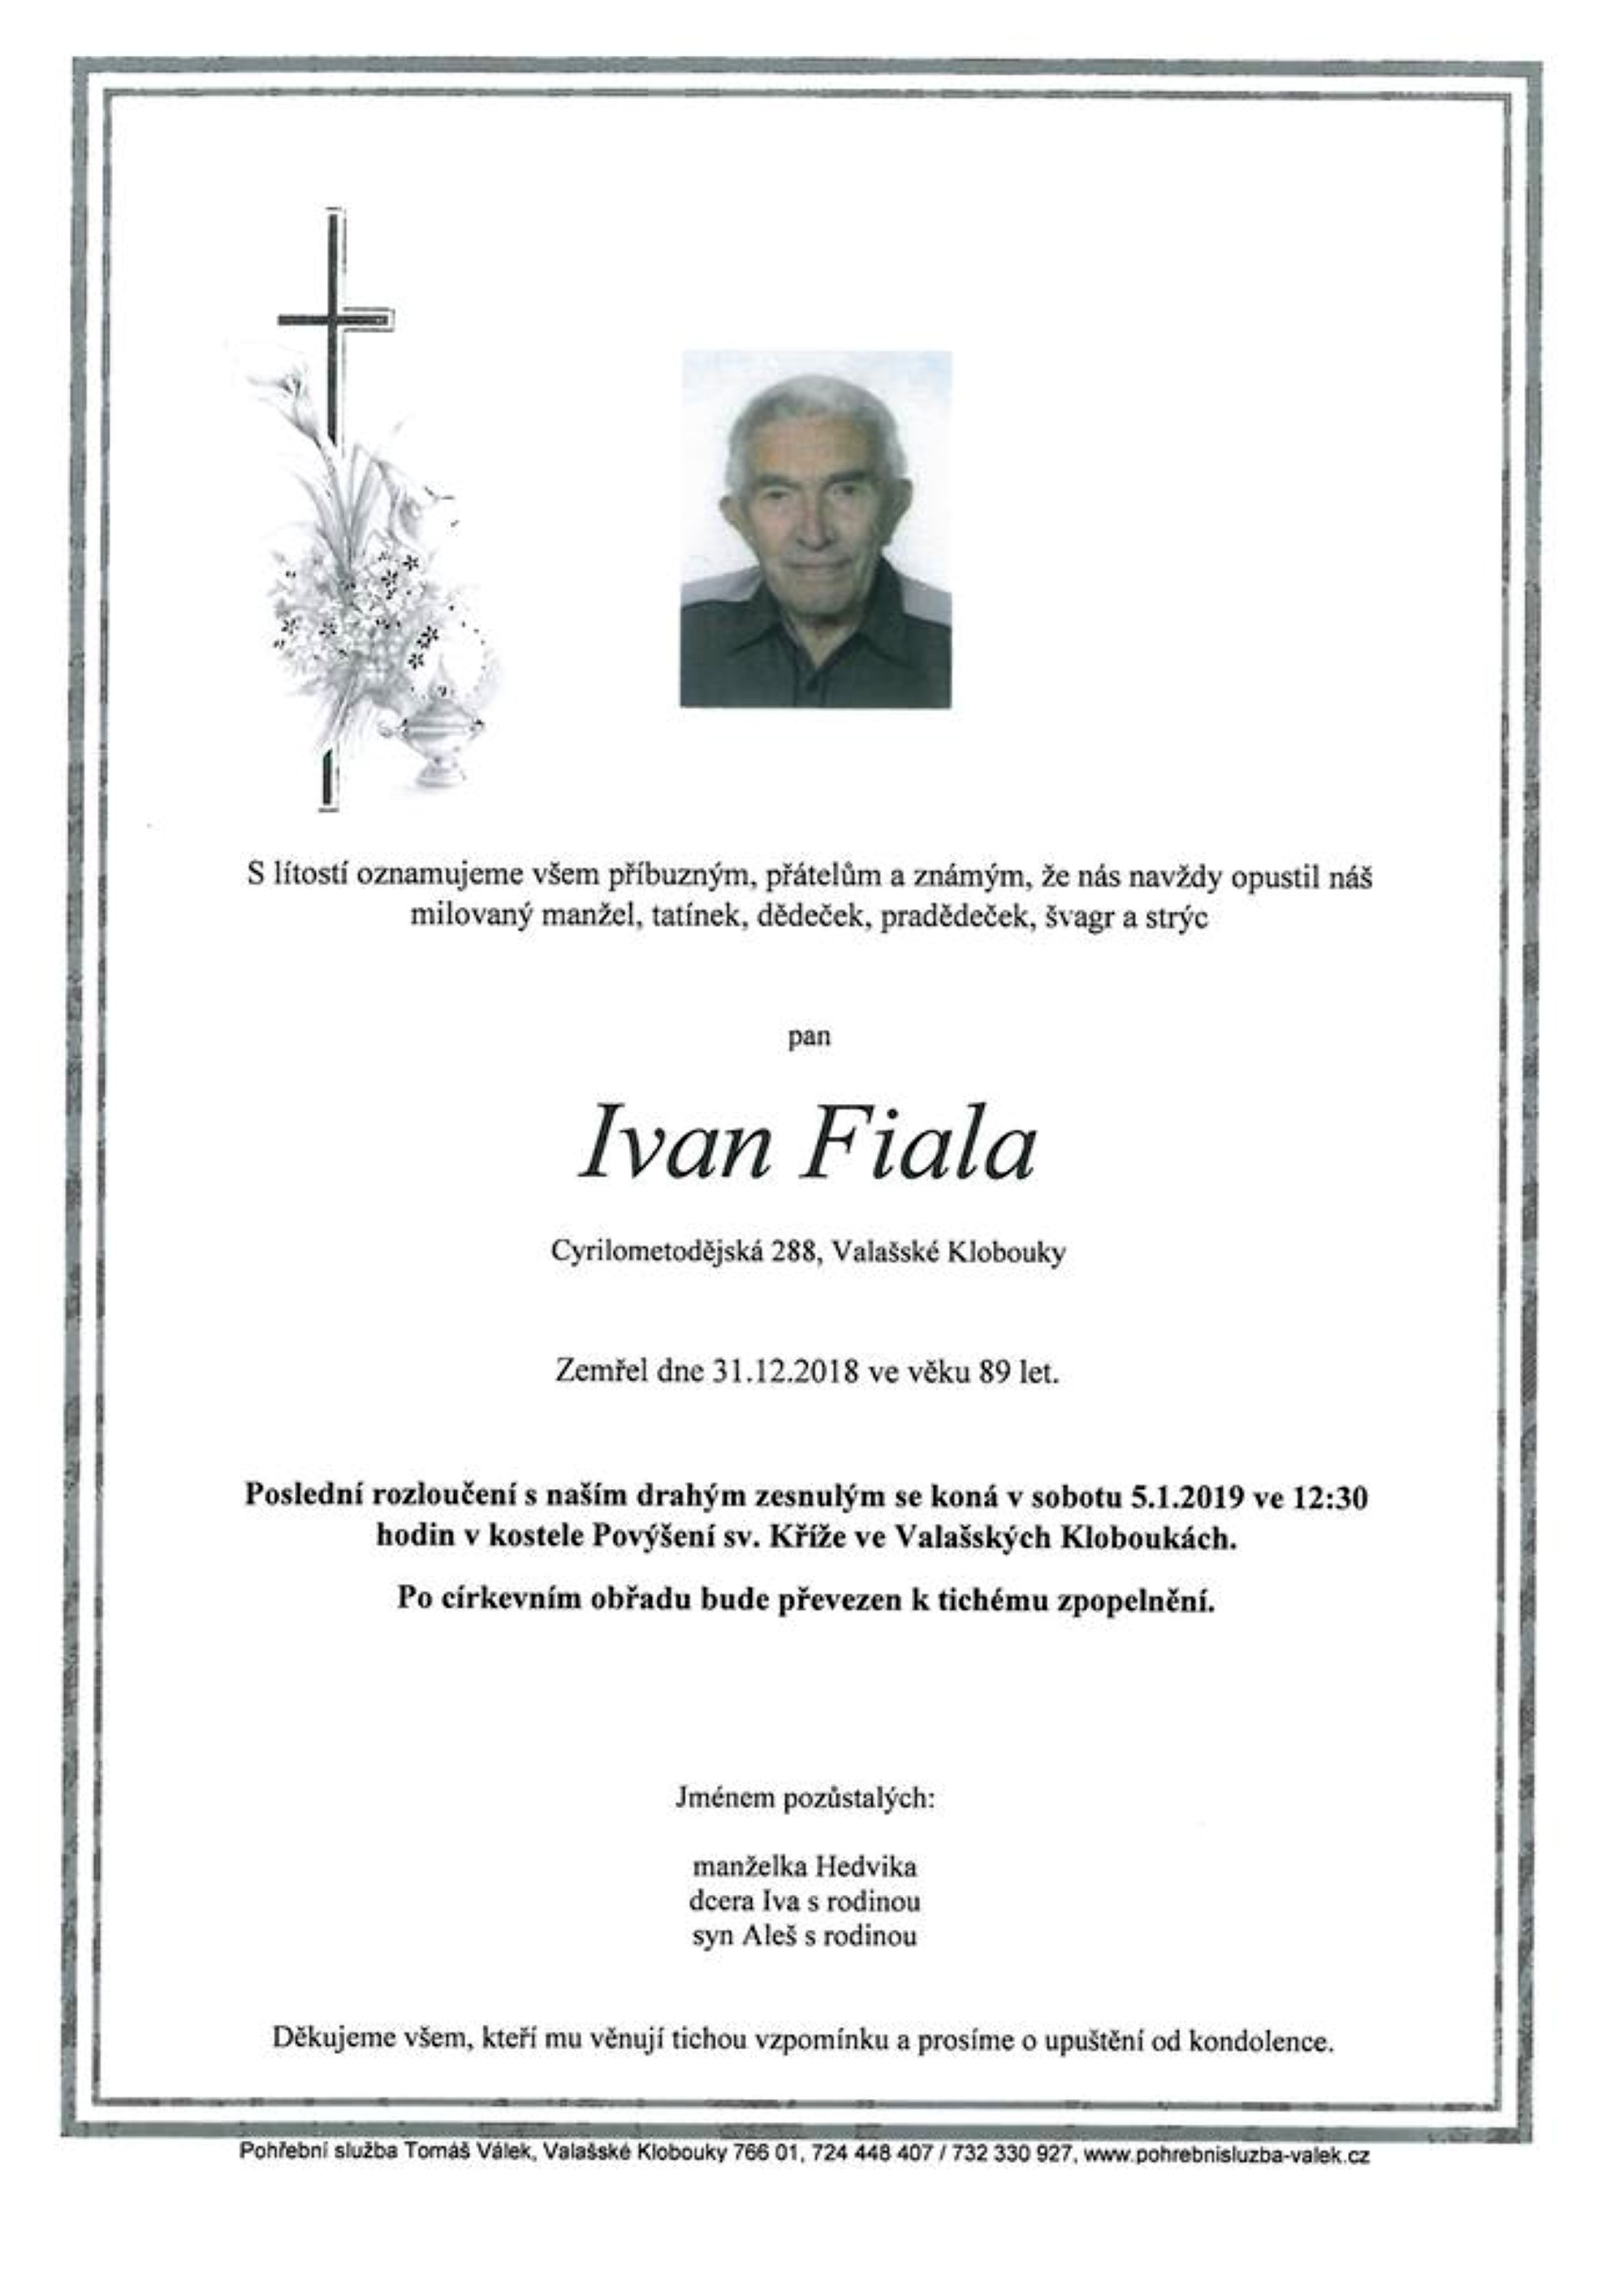 Ivan Fiala